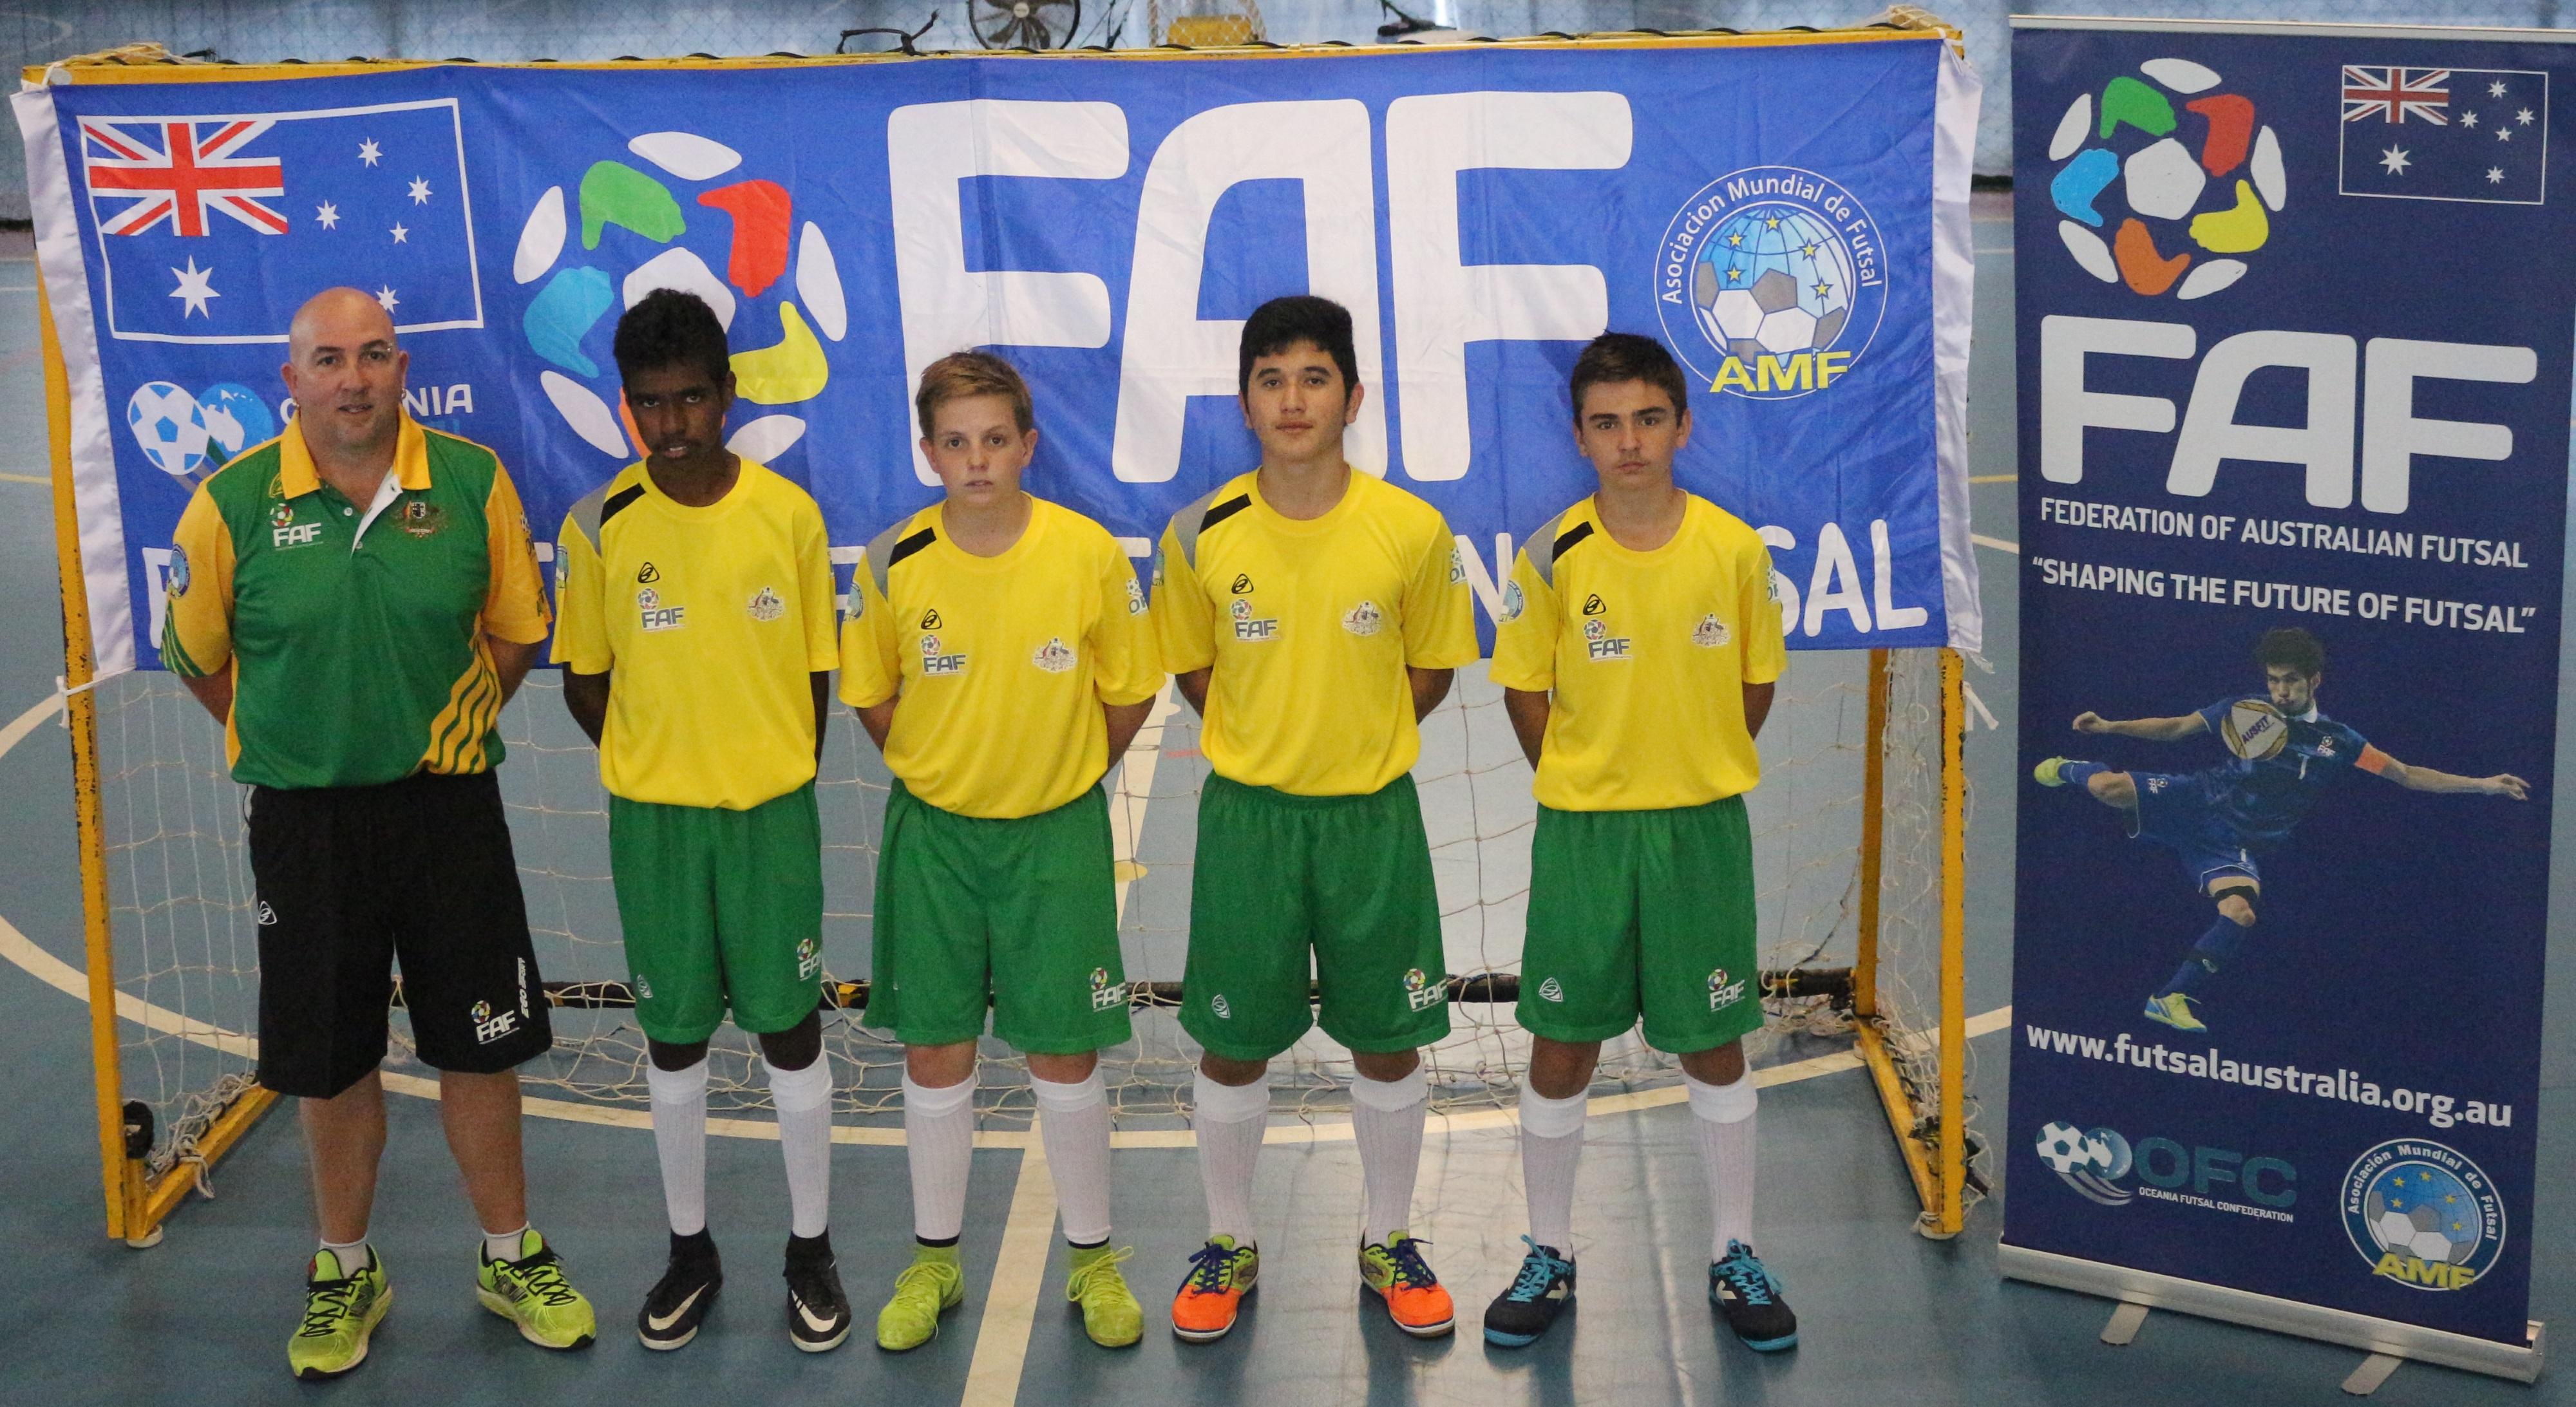 c9c2be784 FAF NATIONAL TEAM UNIFORM PARTNERSHIP – Futsal